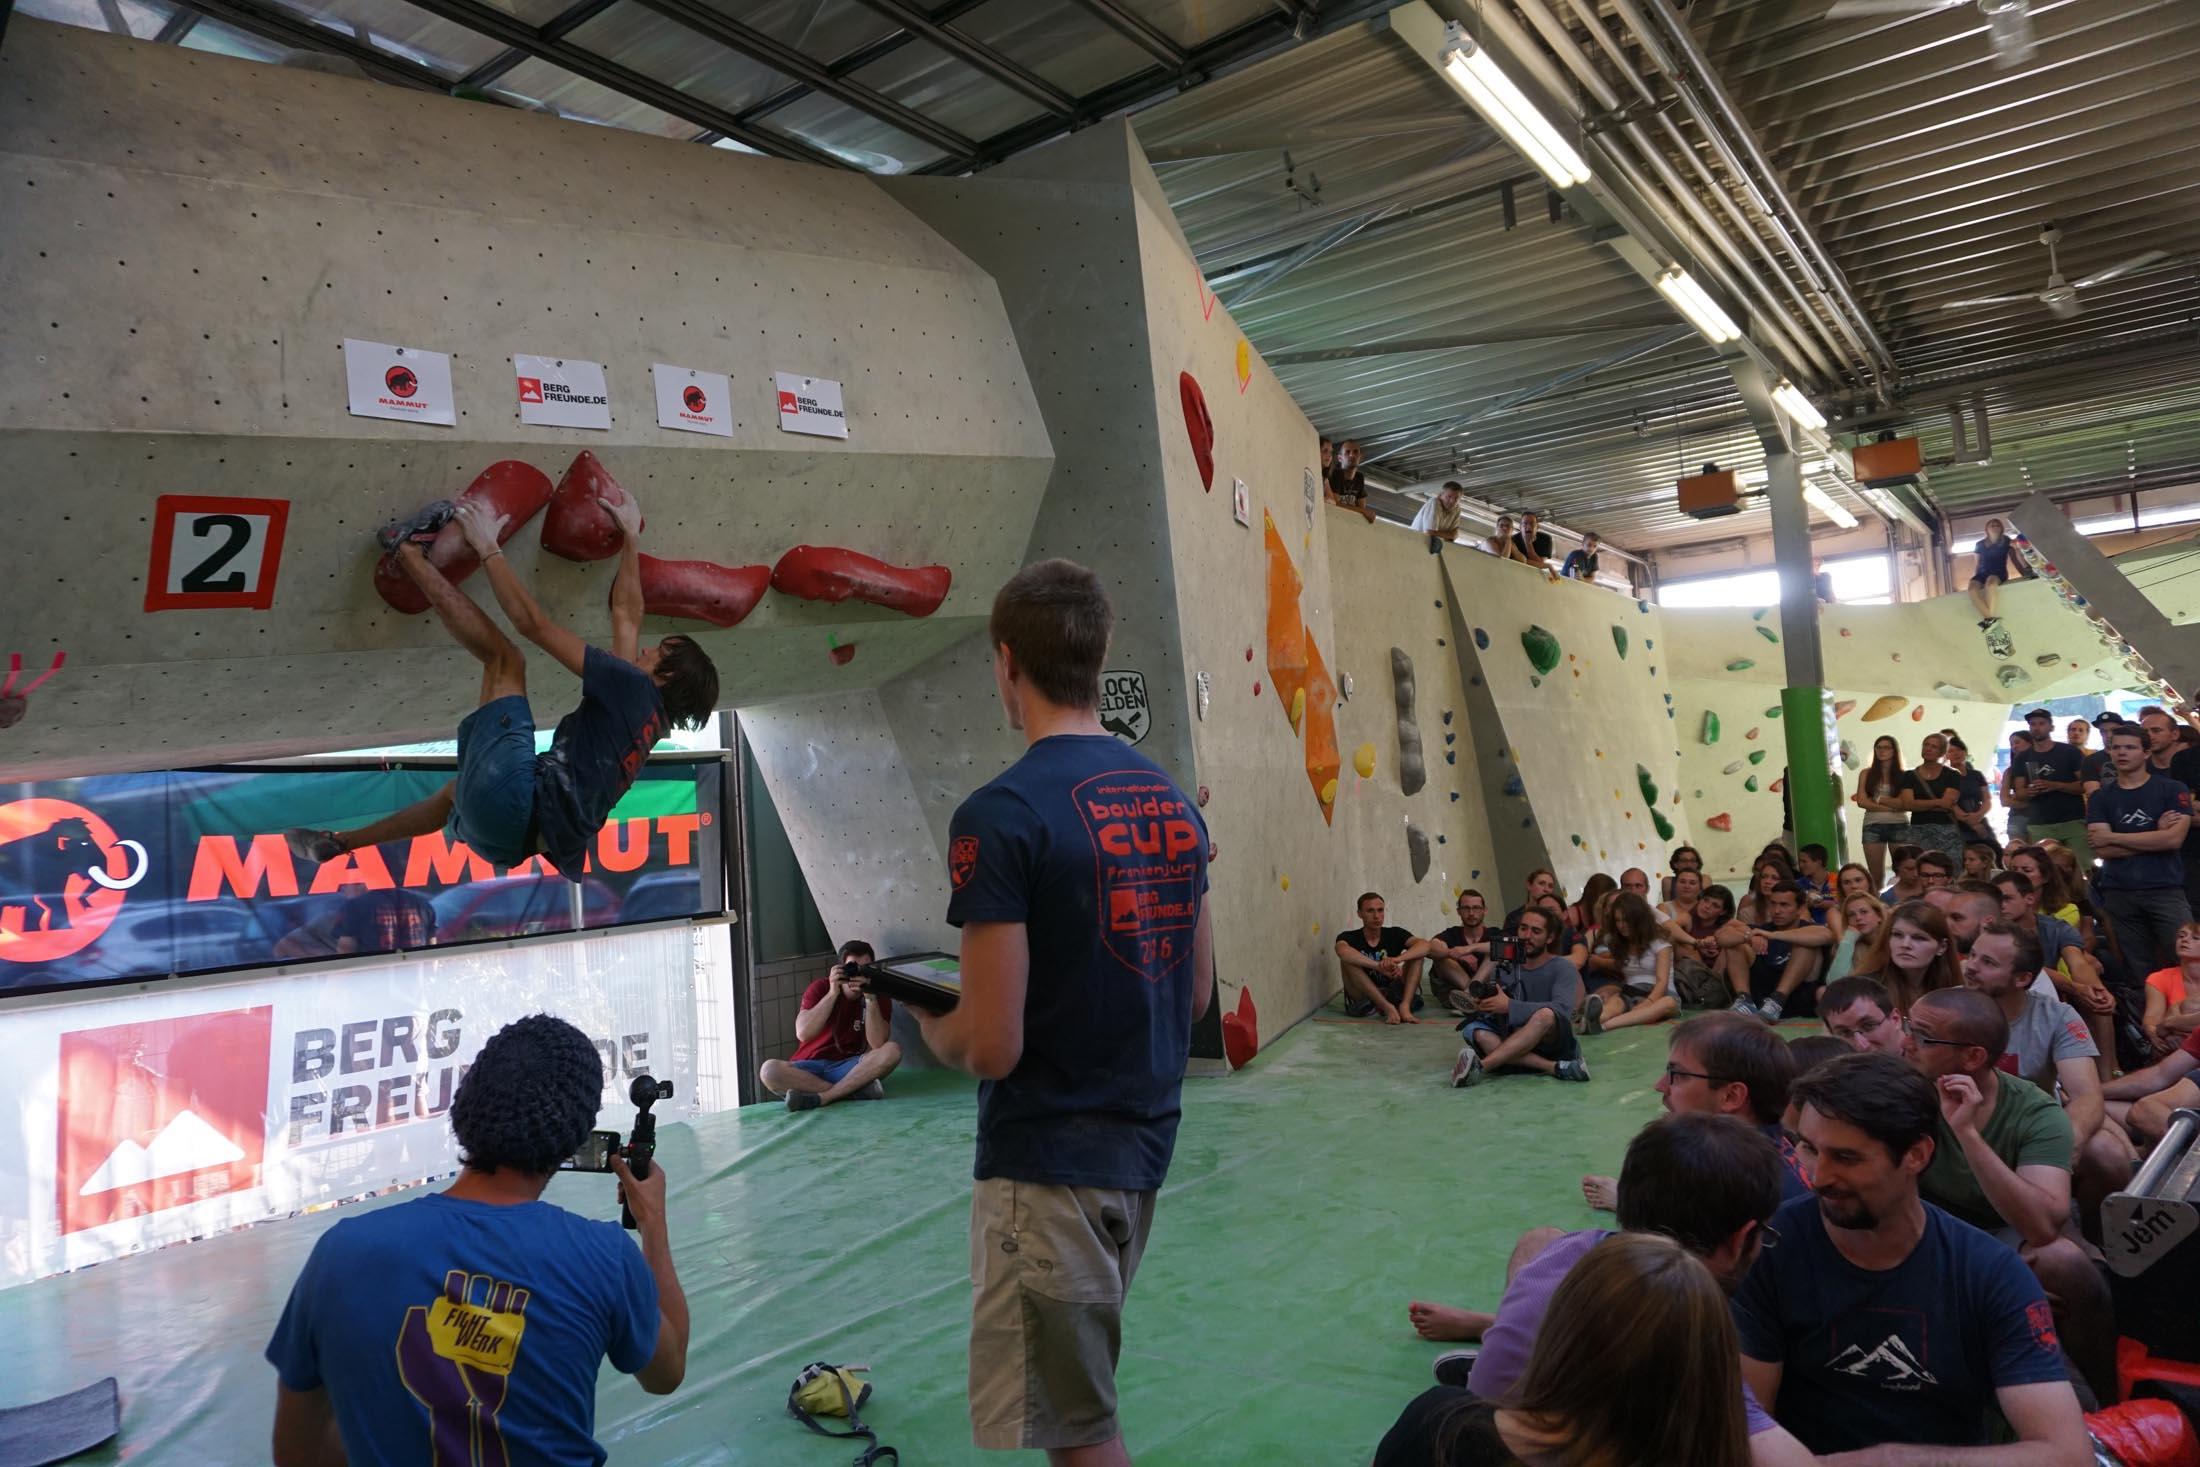 Finale, internationaler bouldercup Frankenjura 2016, BLOCKHELDEN Erlangen, Mammut, Bergfreunde.de, Boulderwettkampf07092016610